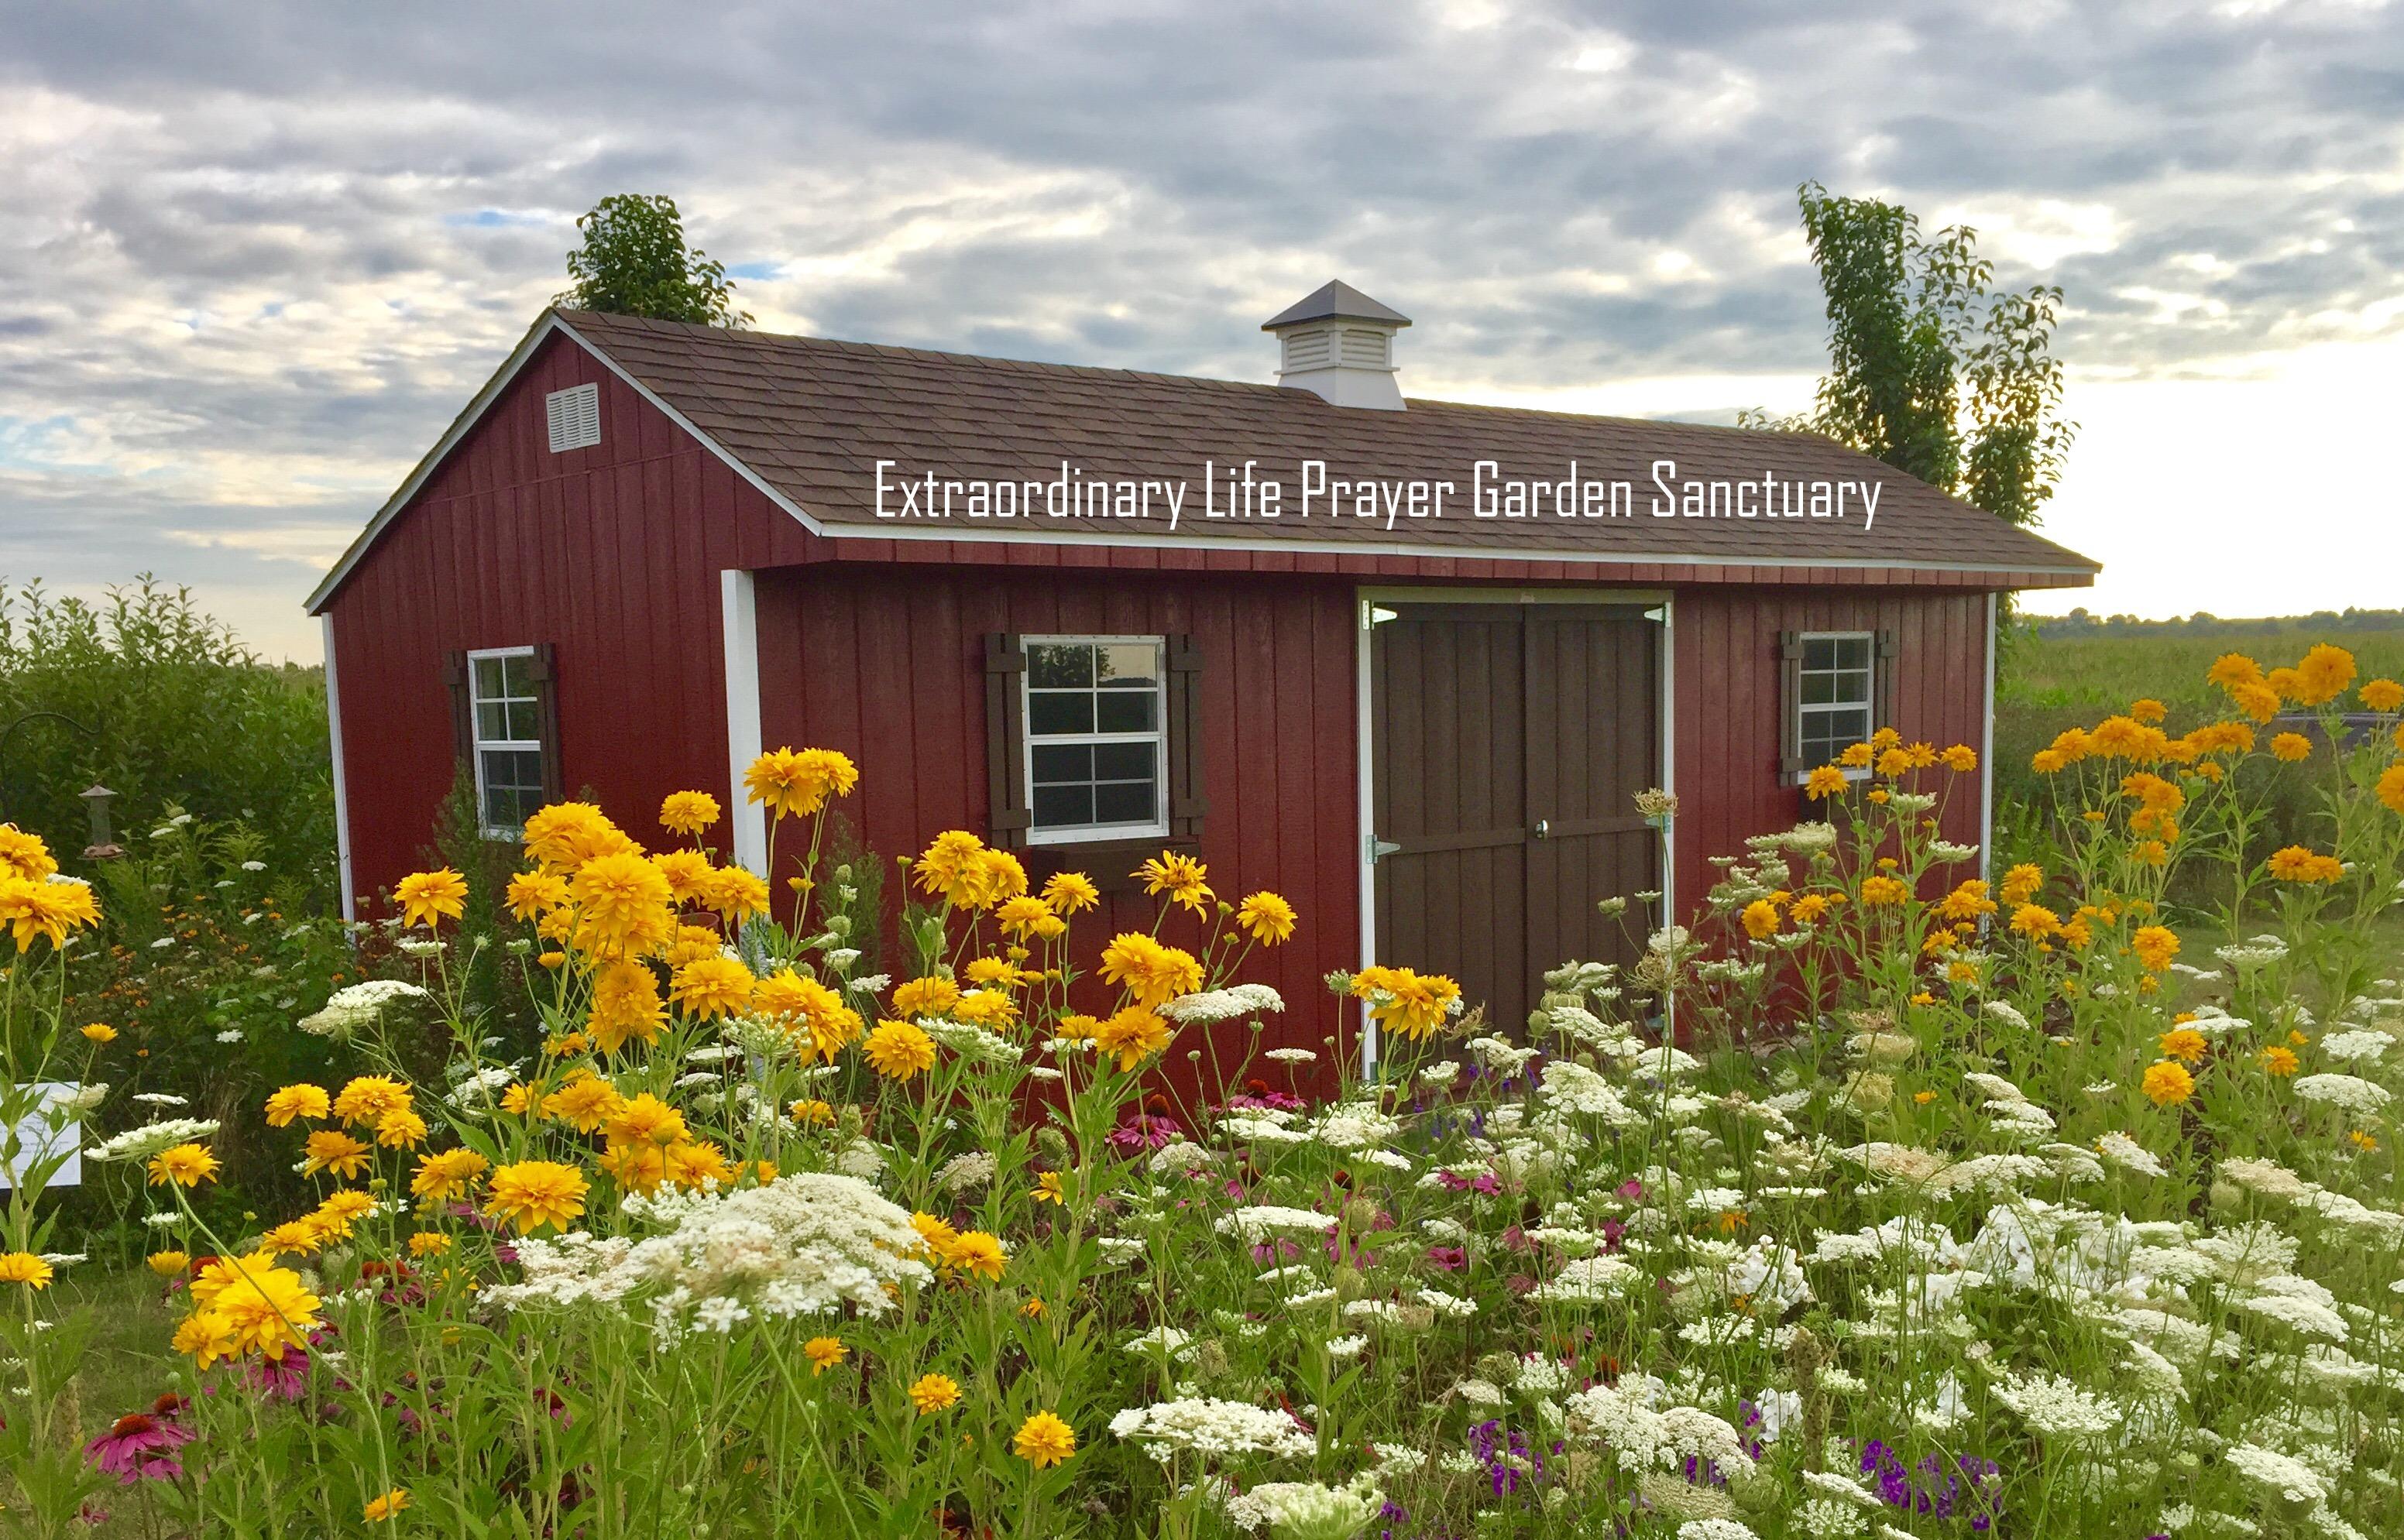 https://0201.nccdn.net/1_2/000/000/15c/6ba/sanctuary.jpg